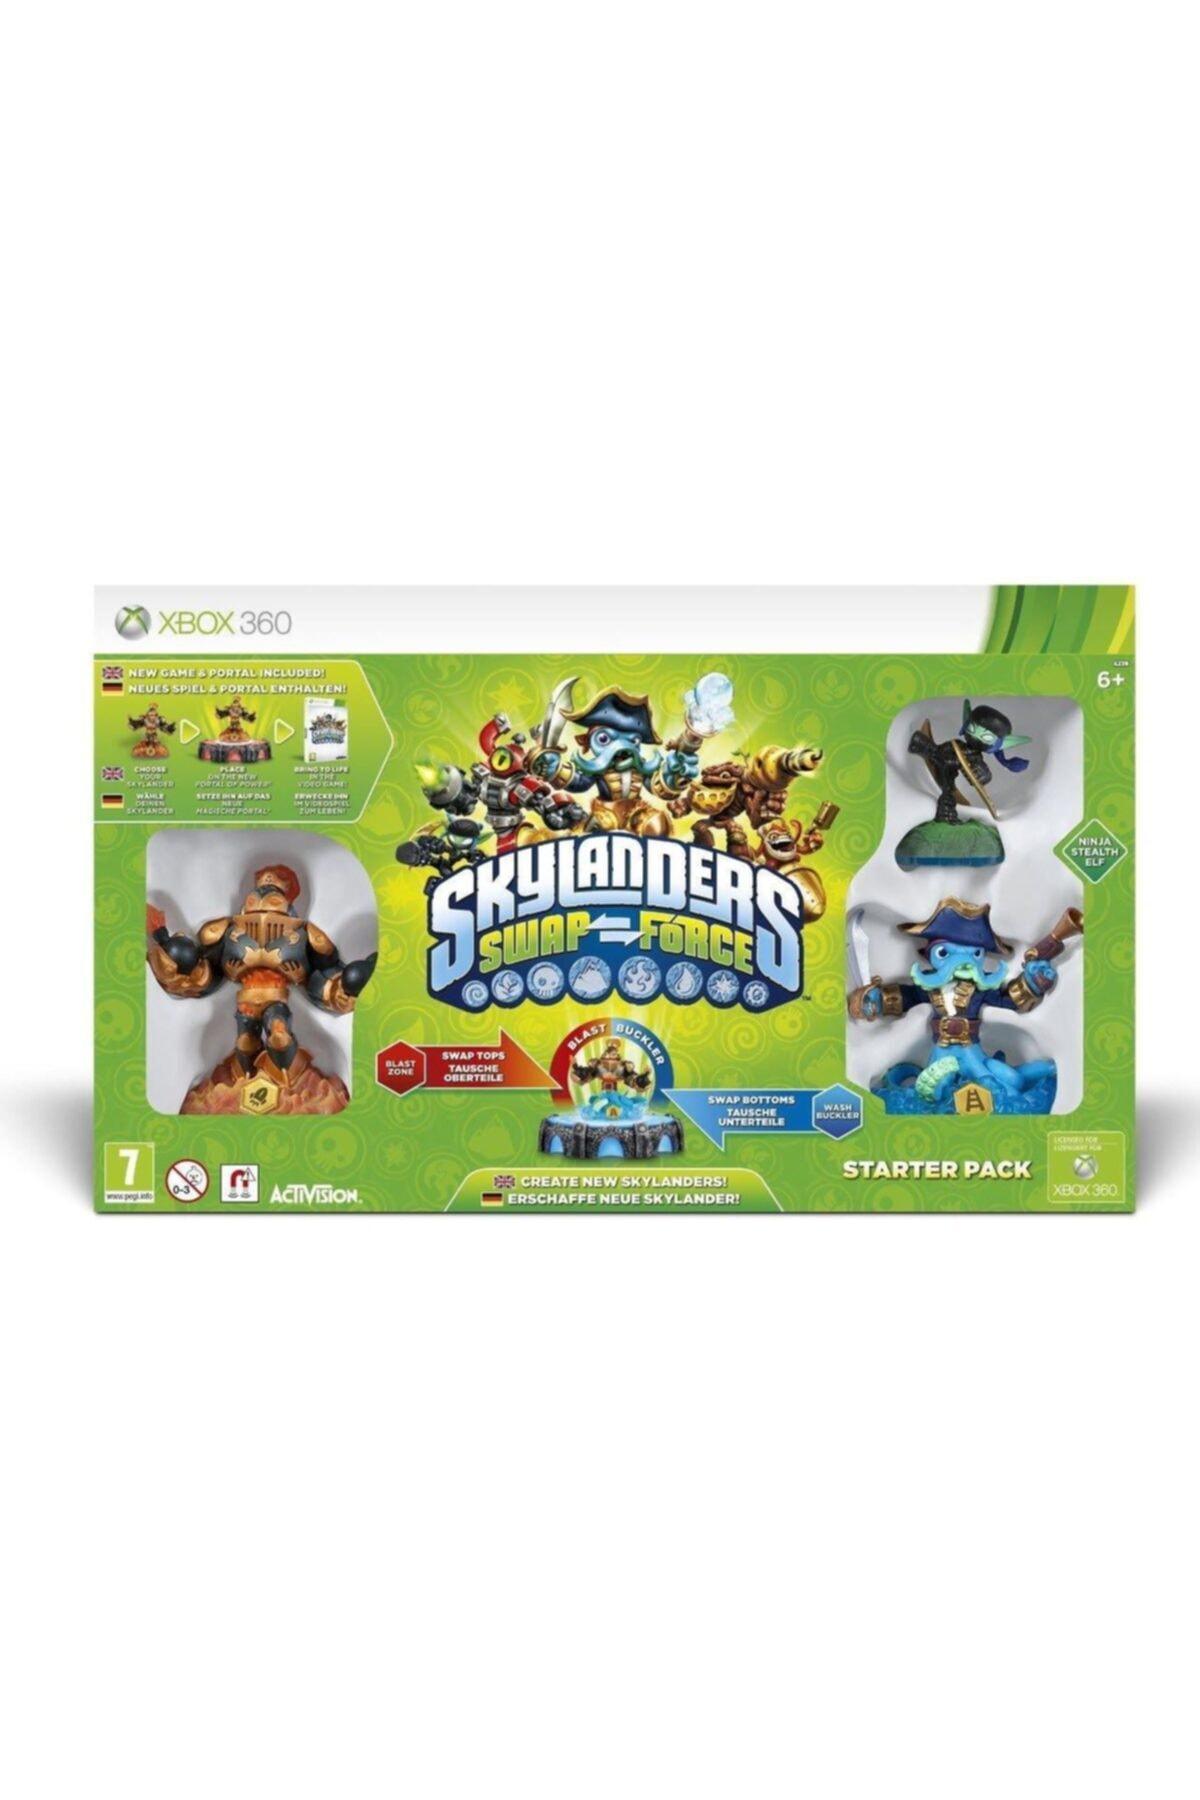 ACTIVISION Xbox 360 Skylanders Swap Force Starter Pack 1